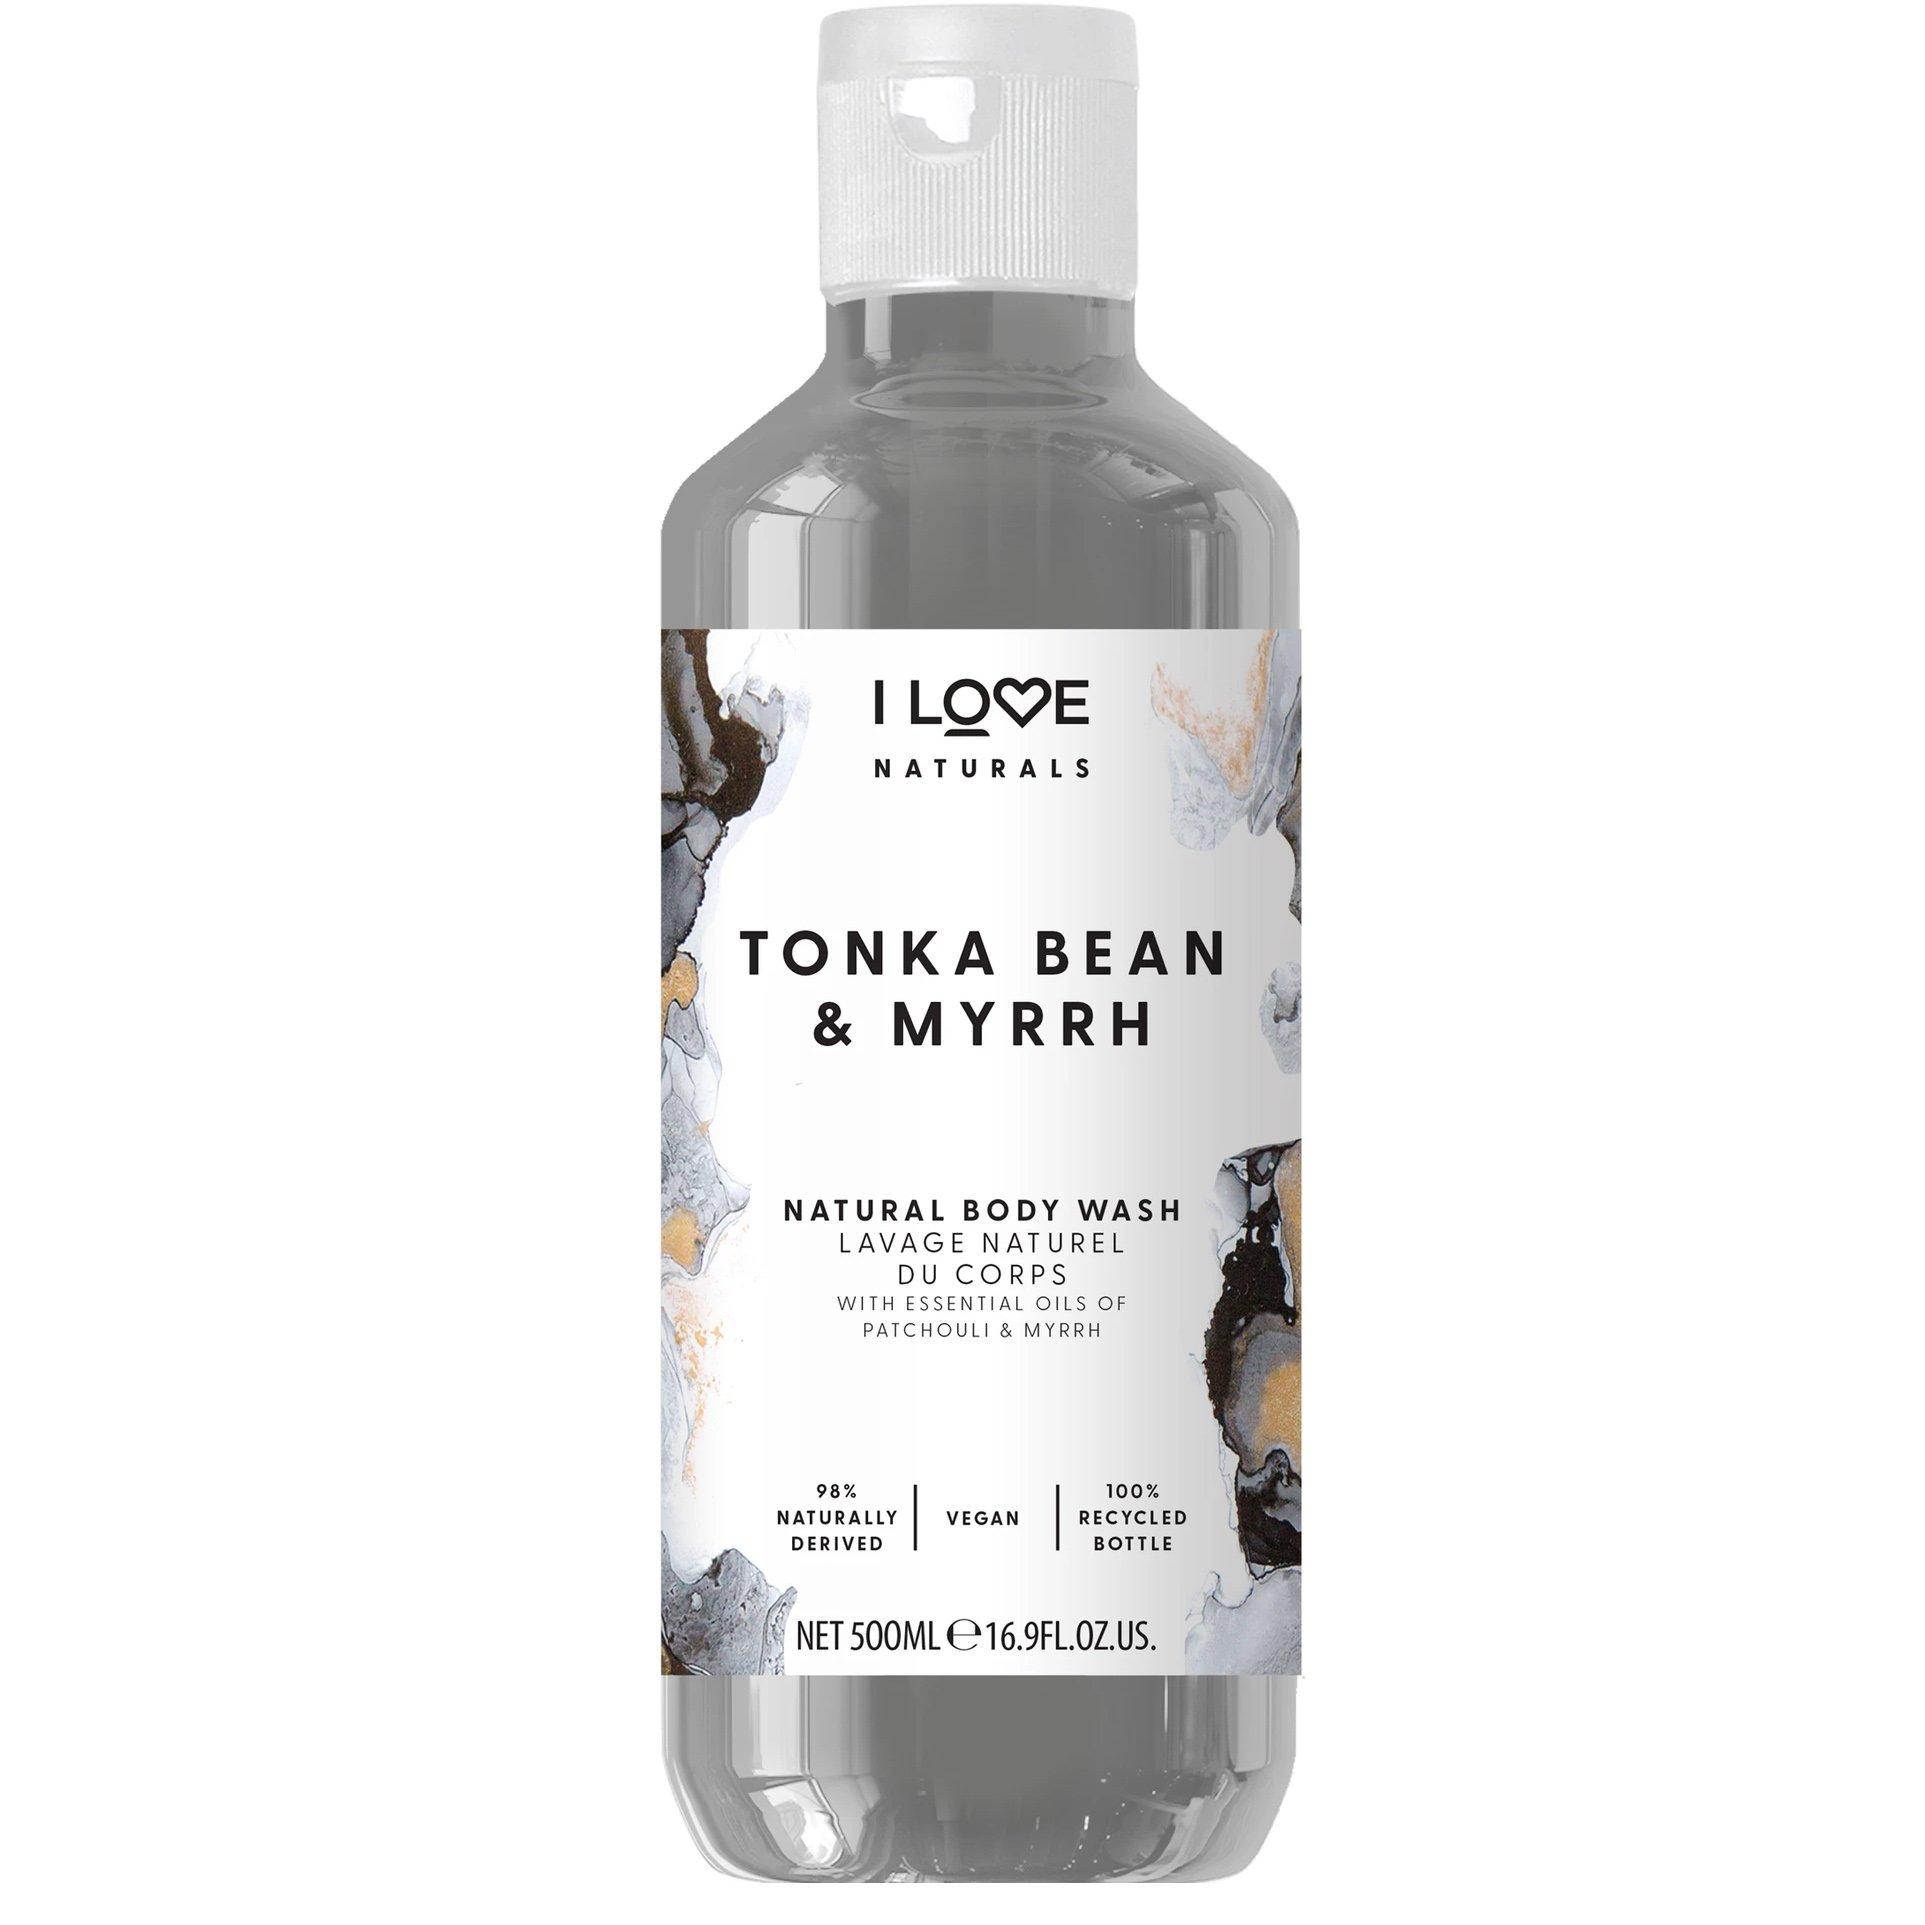 I love… Tonka Bean & Myrrh Body Wash Ενυδατικό Αφρόλουτρο με Άρωμα Μύρο & Κανέλα 500ml